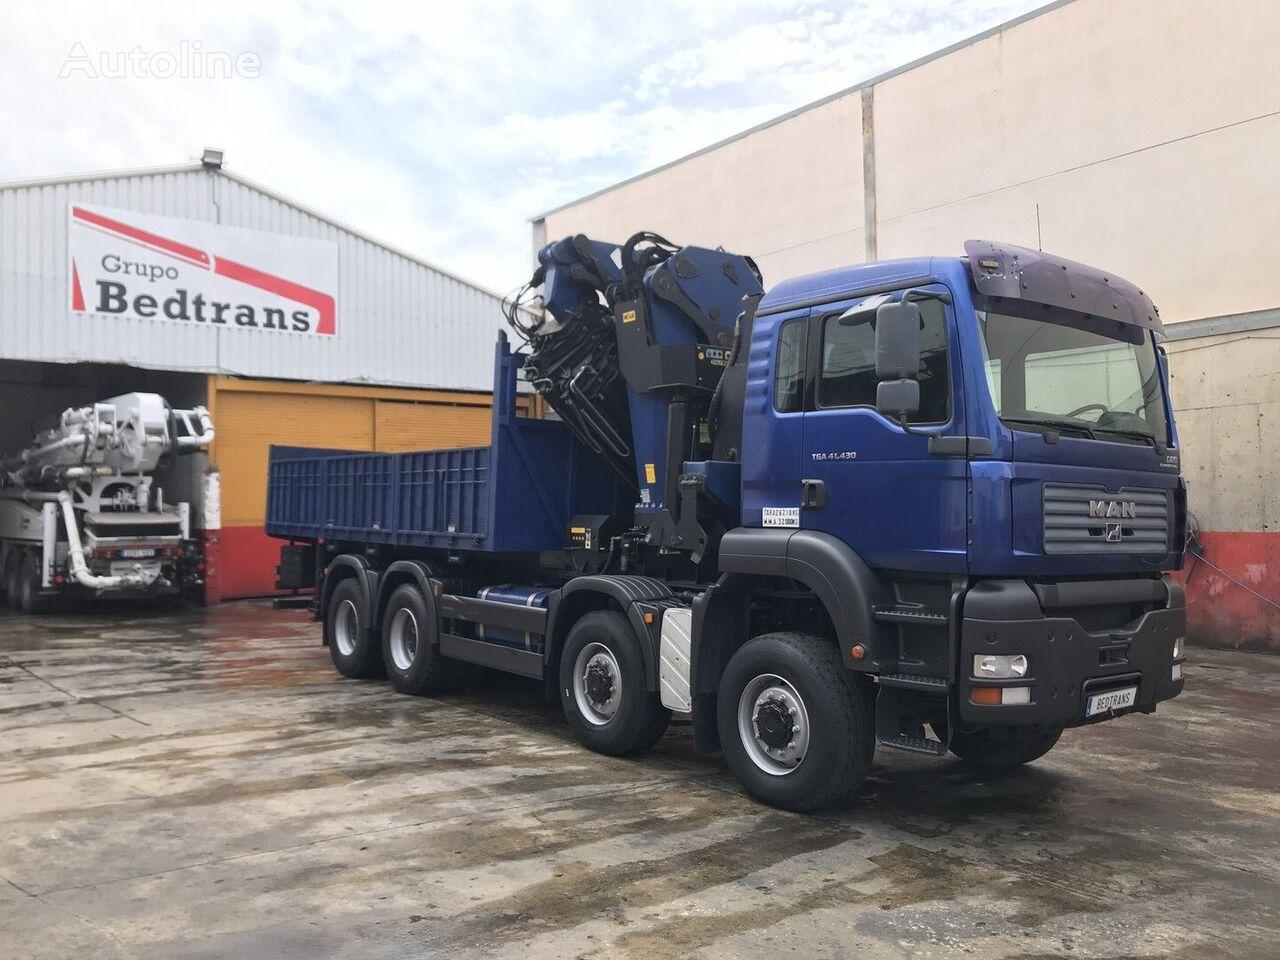 MAN tga 41.430 flatbed truck